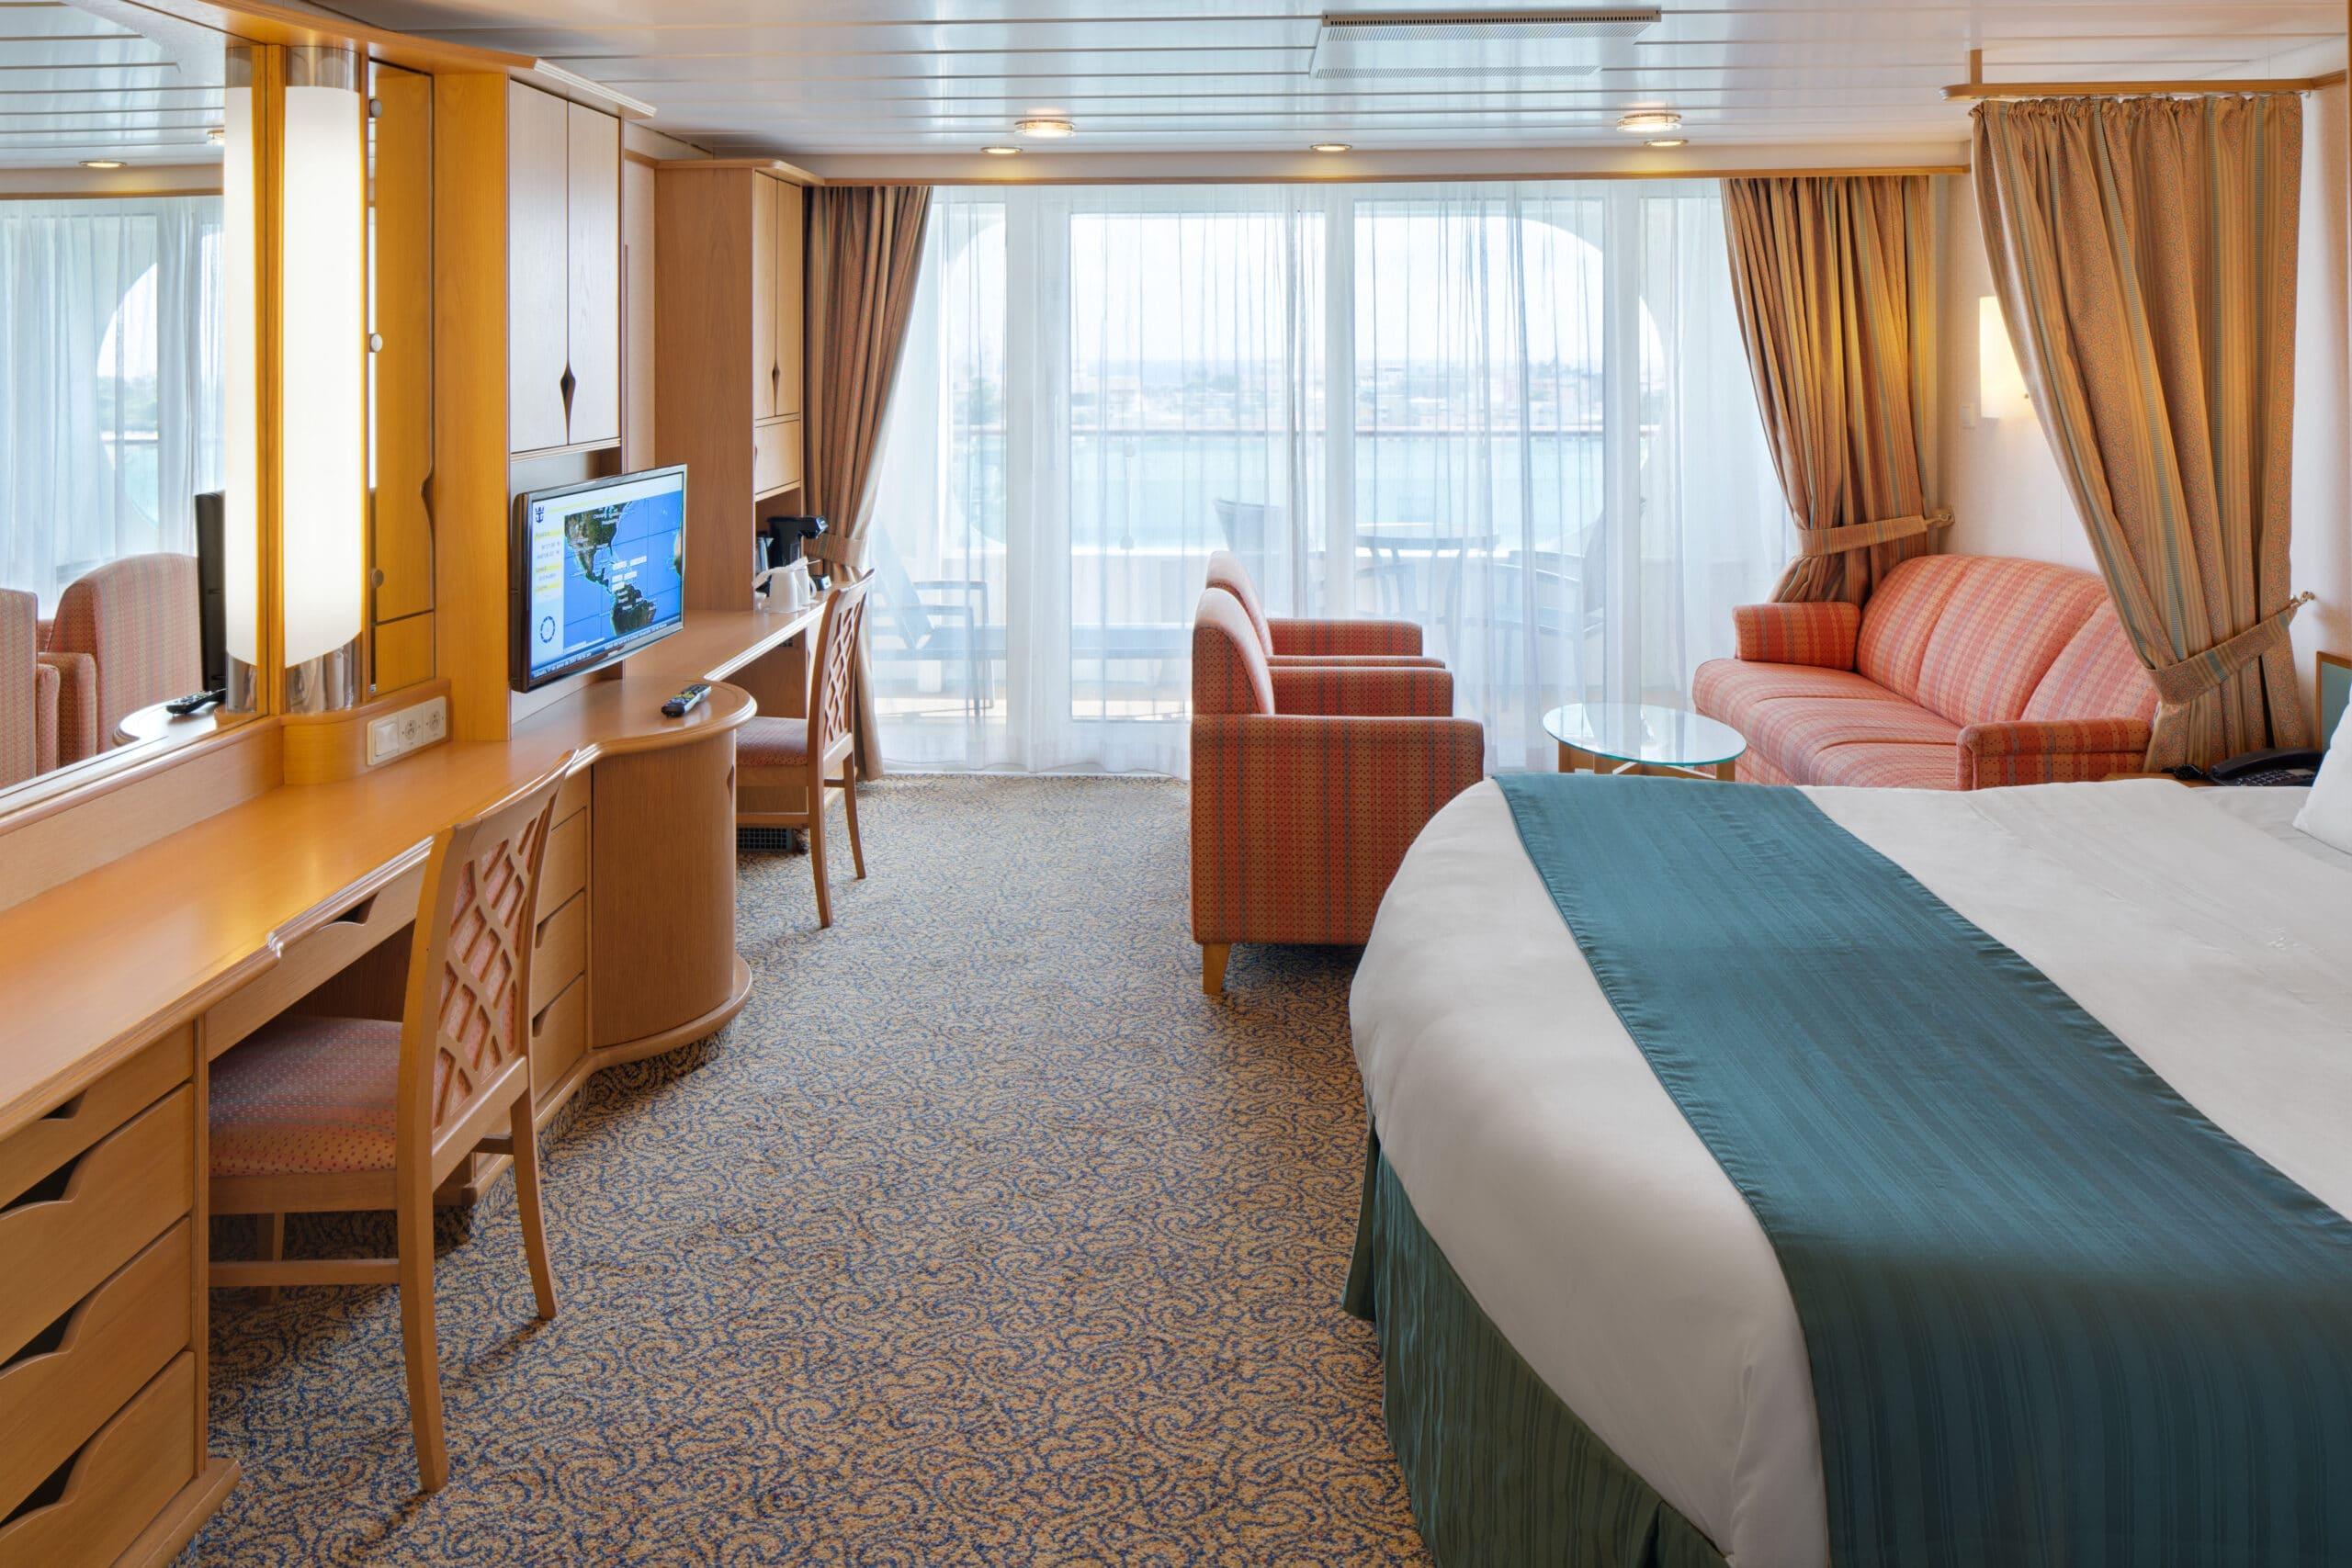 Royal-Caribbean-International-Adventure-of-the-Seas-schip-cruiseschip-categorie-J3-J4-junior-suite